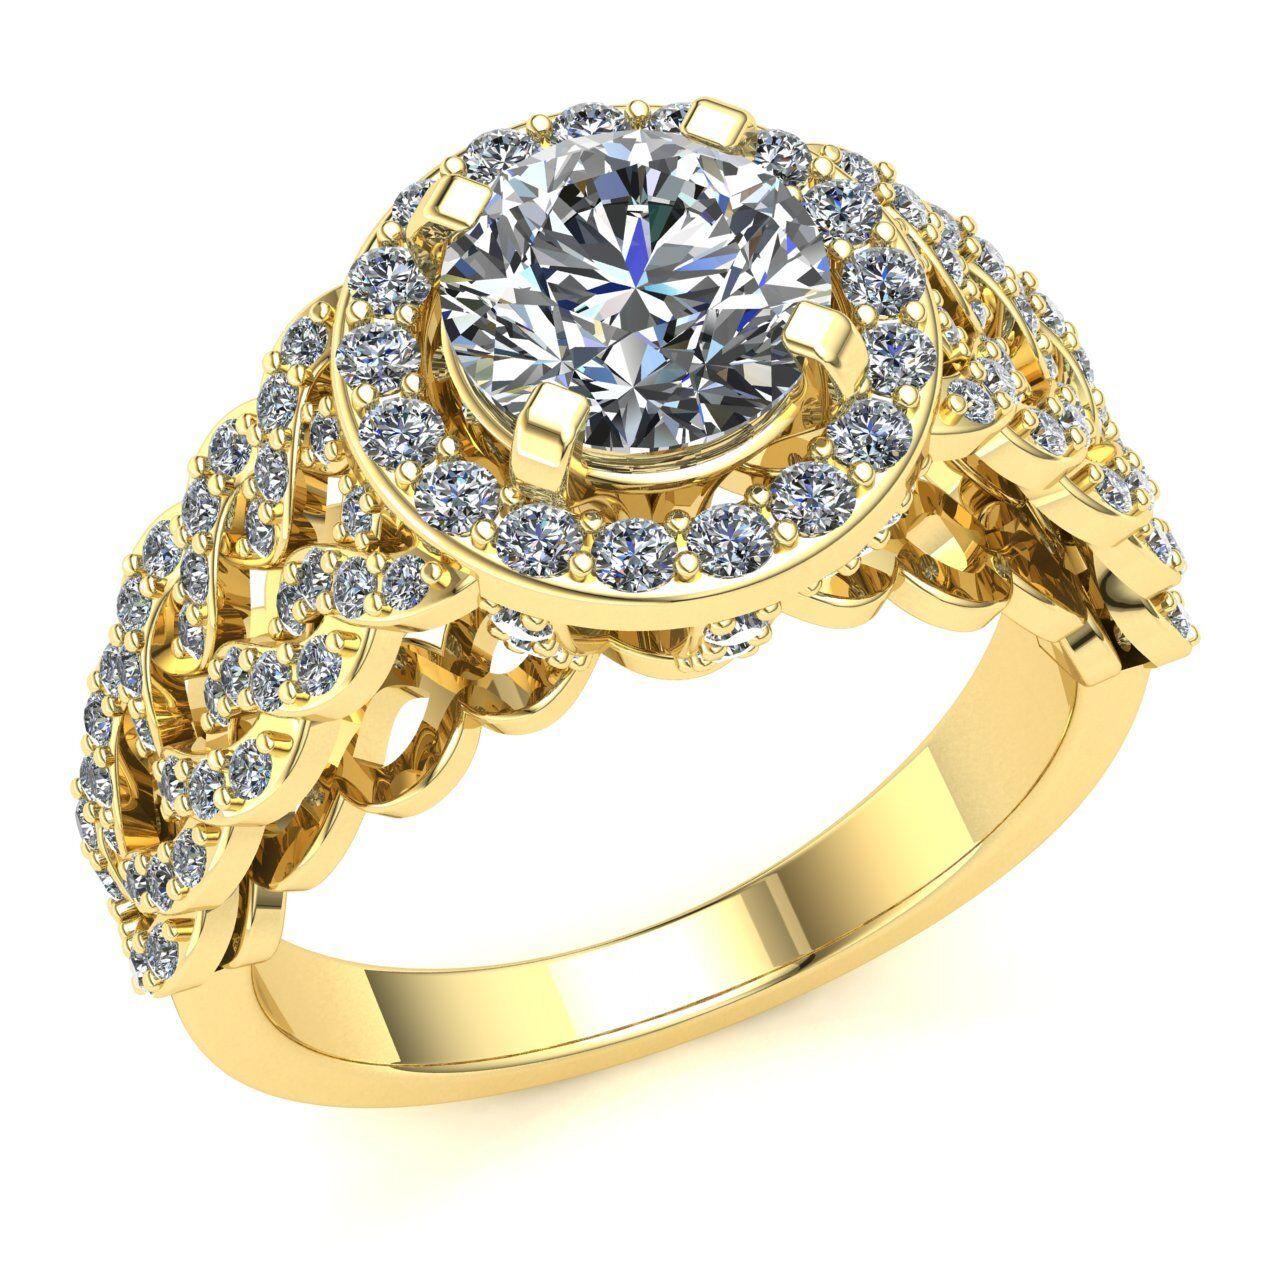 1.5carat Round Cut Diamond Bridal Halo Solitaire Bridal Engagement Ring 10K gold